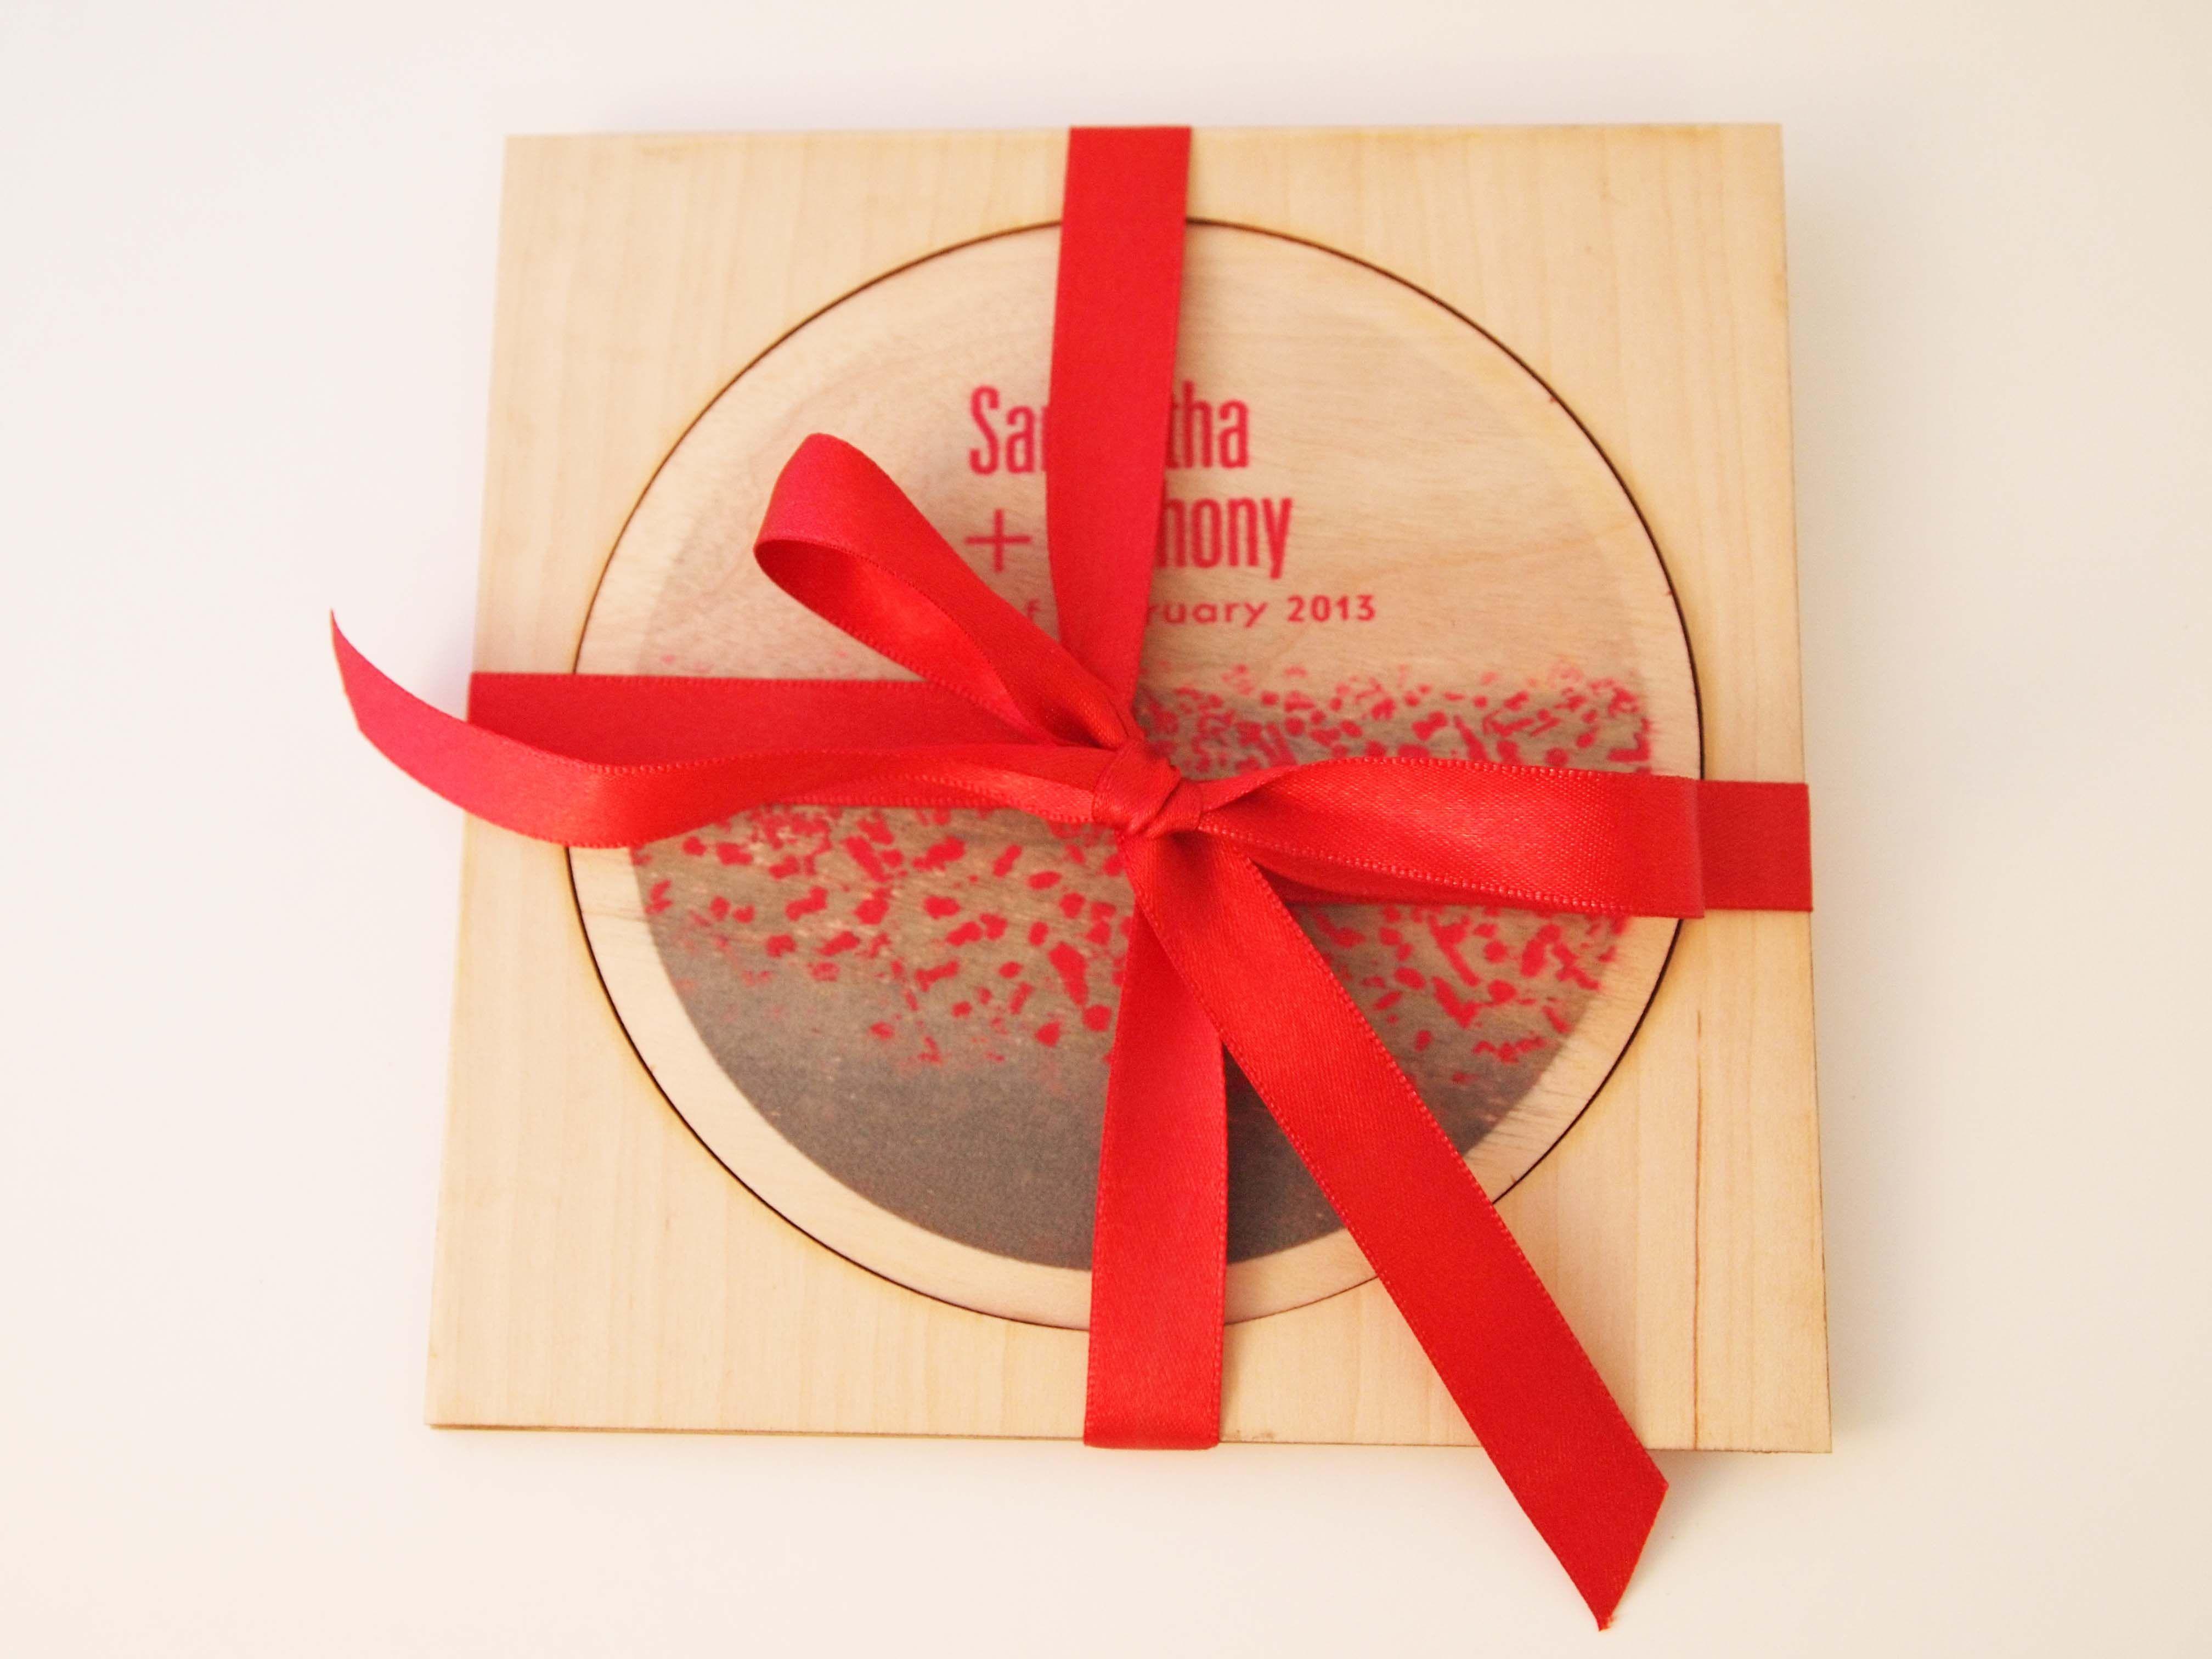 Red poppies- Digital printing on wood creates a romantic invitation ...